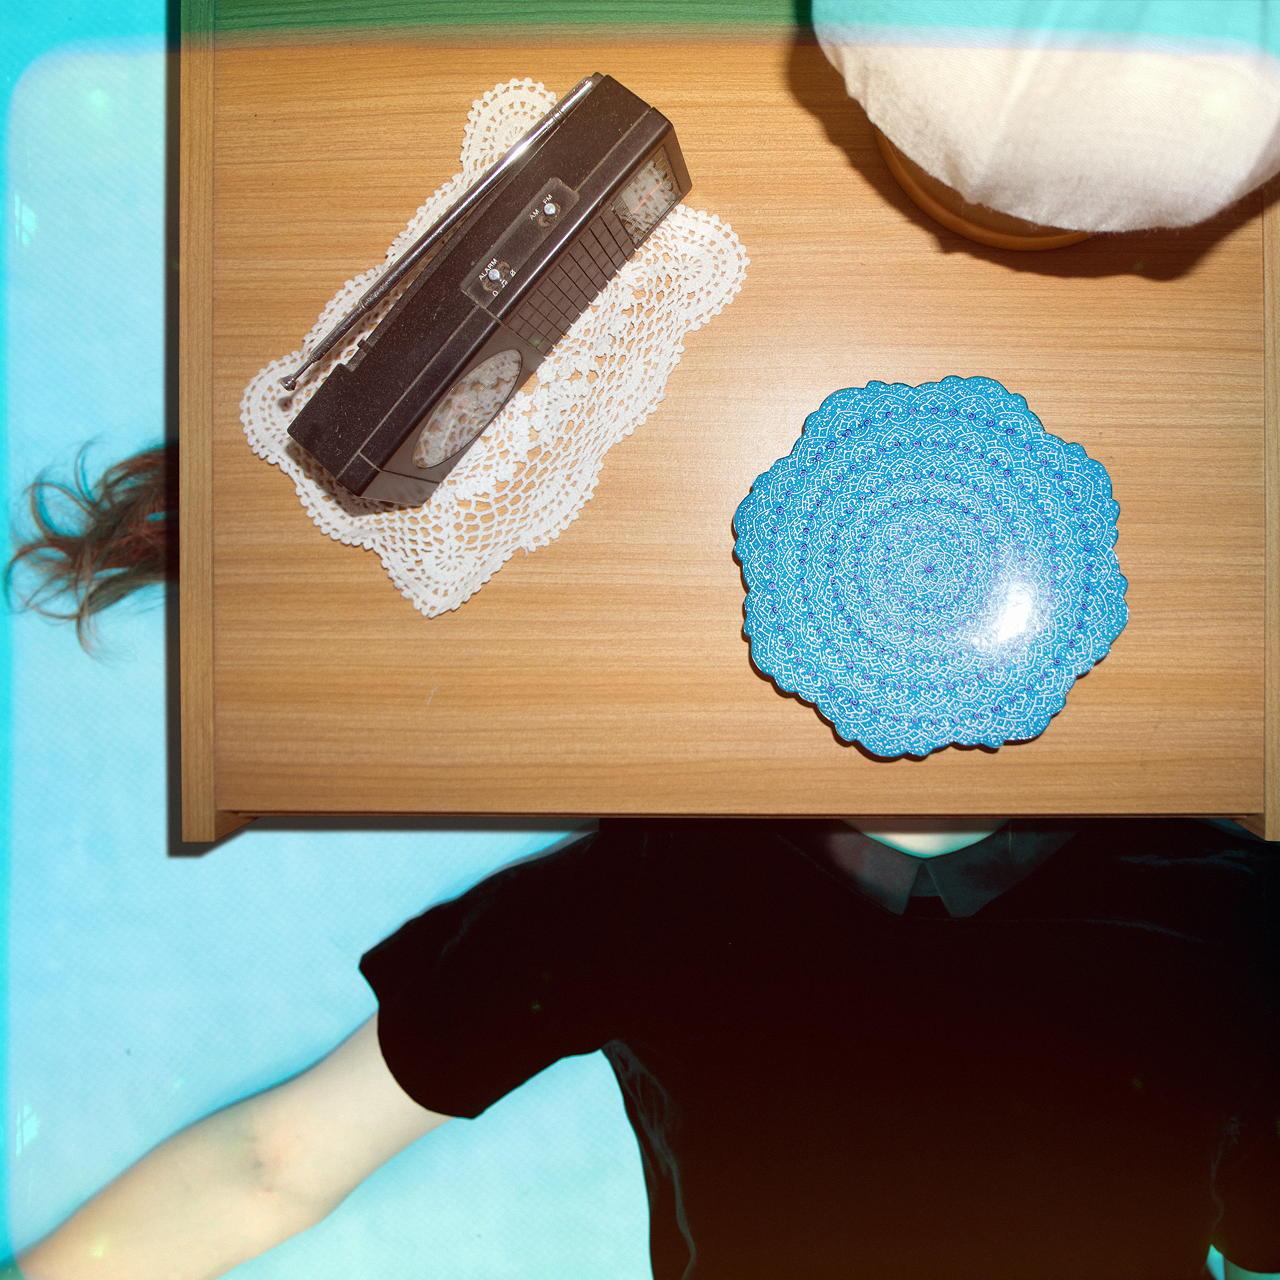 Peter Franck - Table stories - Felix Schoeller Photoaward